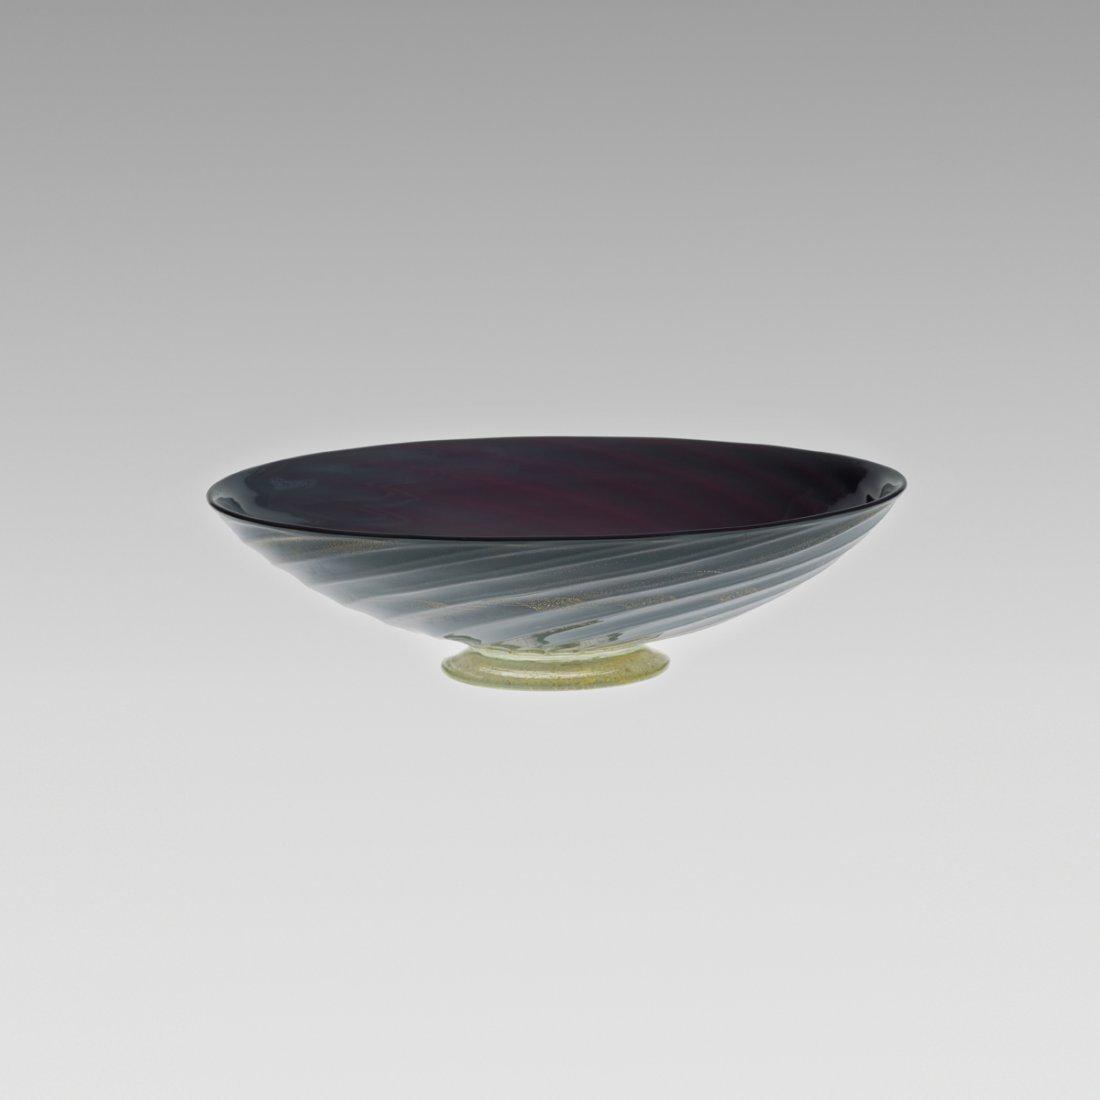 121: Barovier Seguso & Ferro bowl